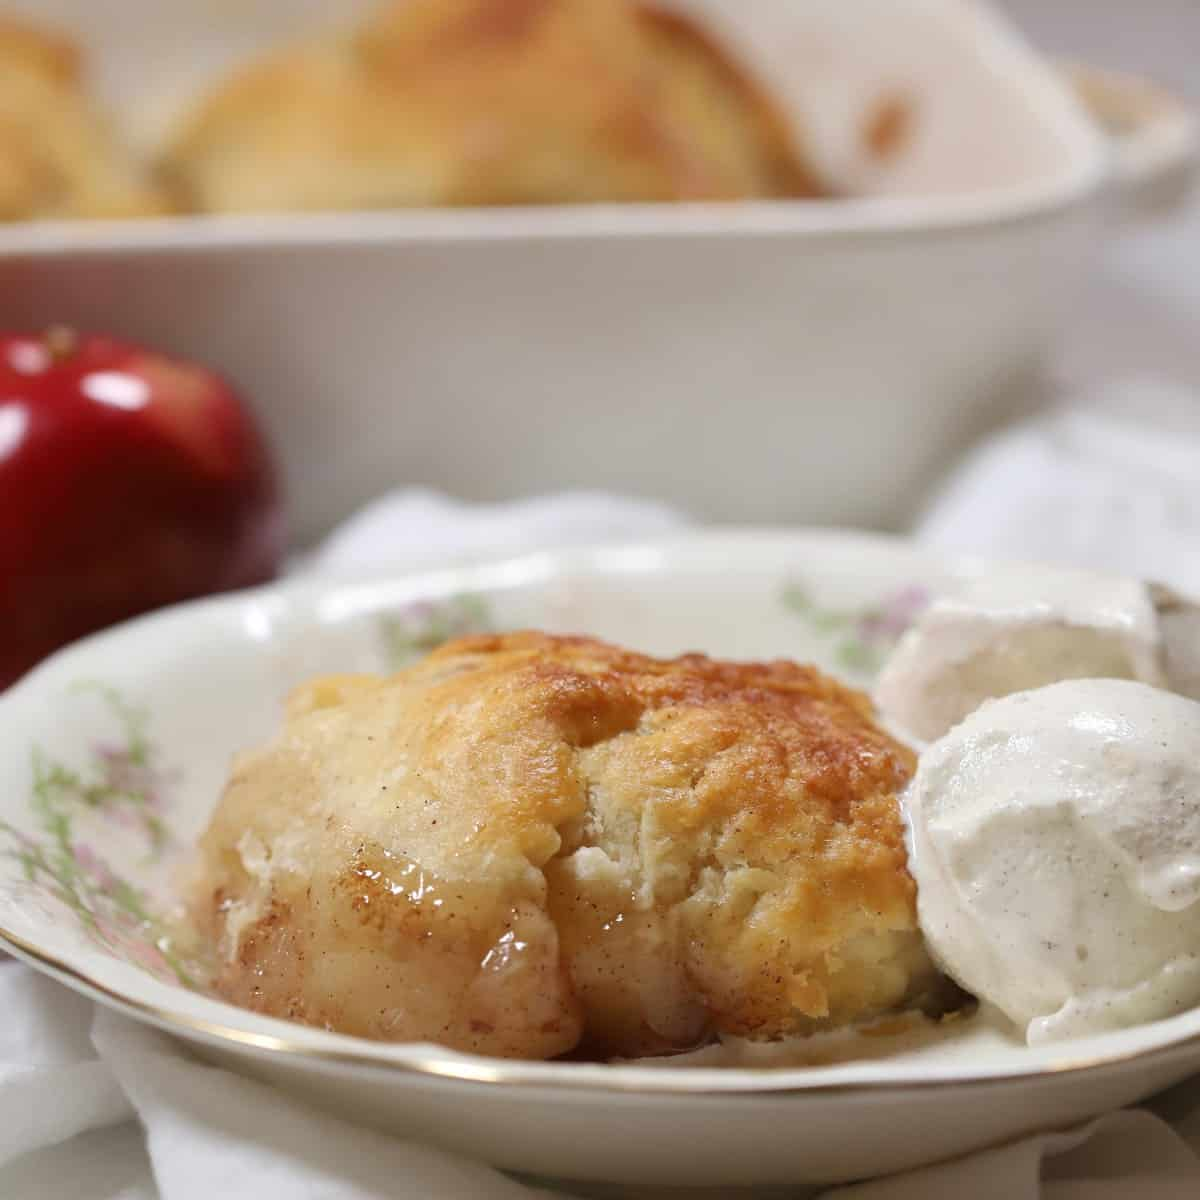 Homemade Apple Dumpling Recipe Gritsandpinecones Com